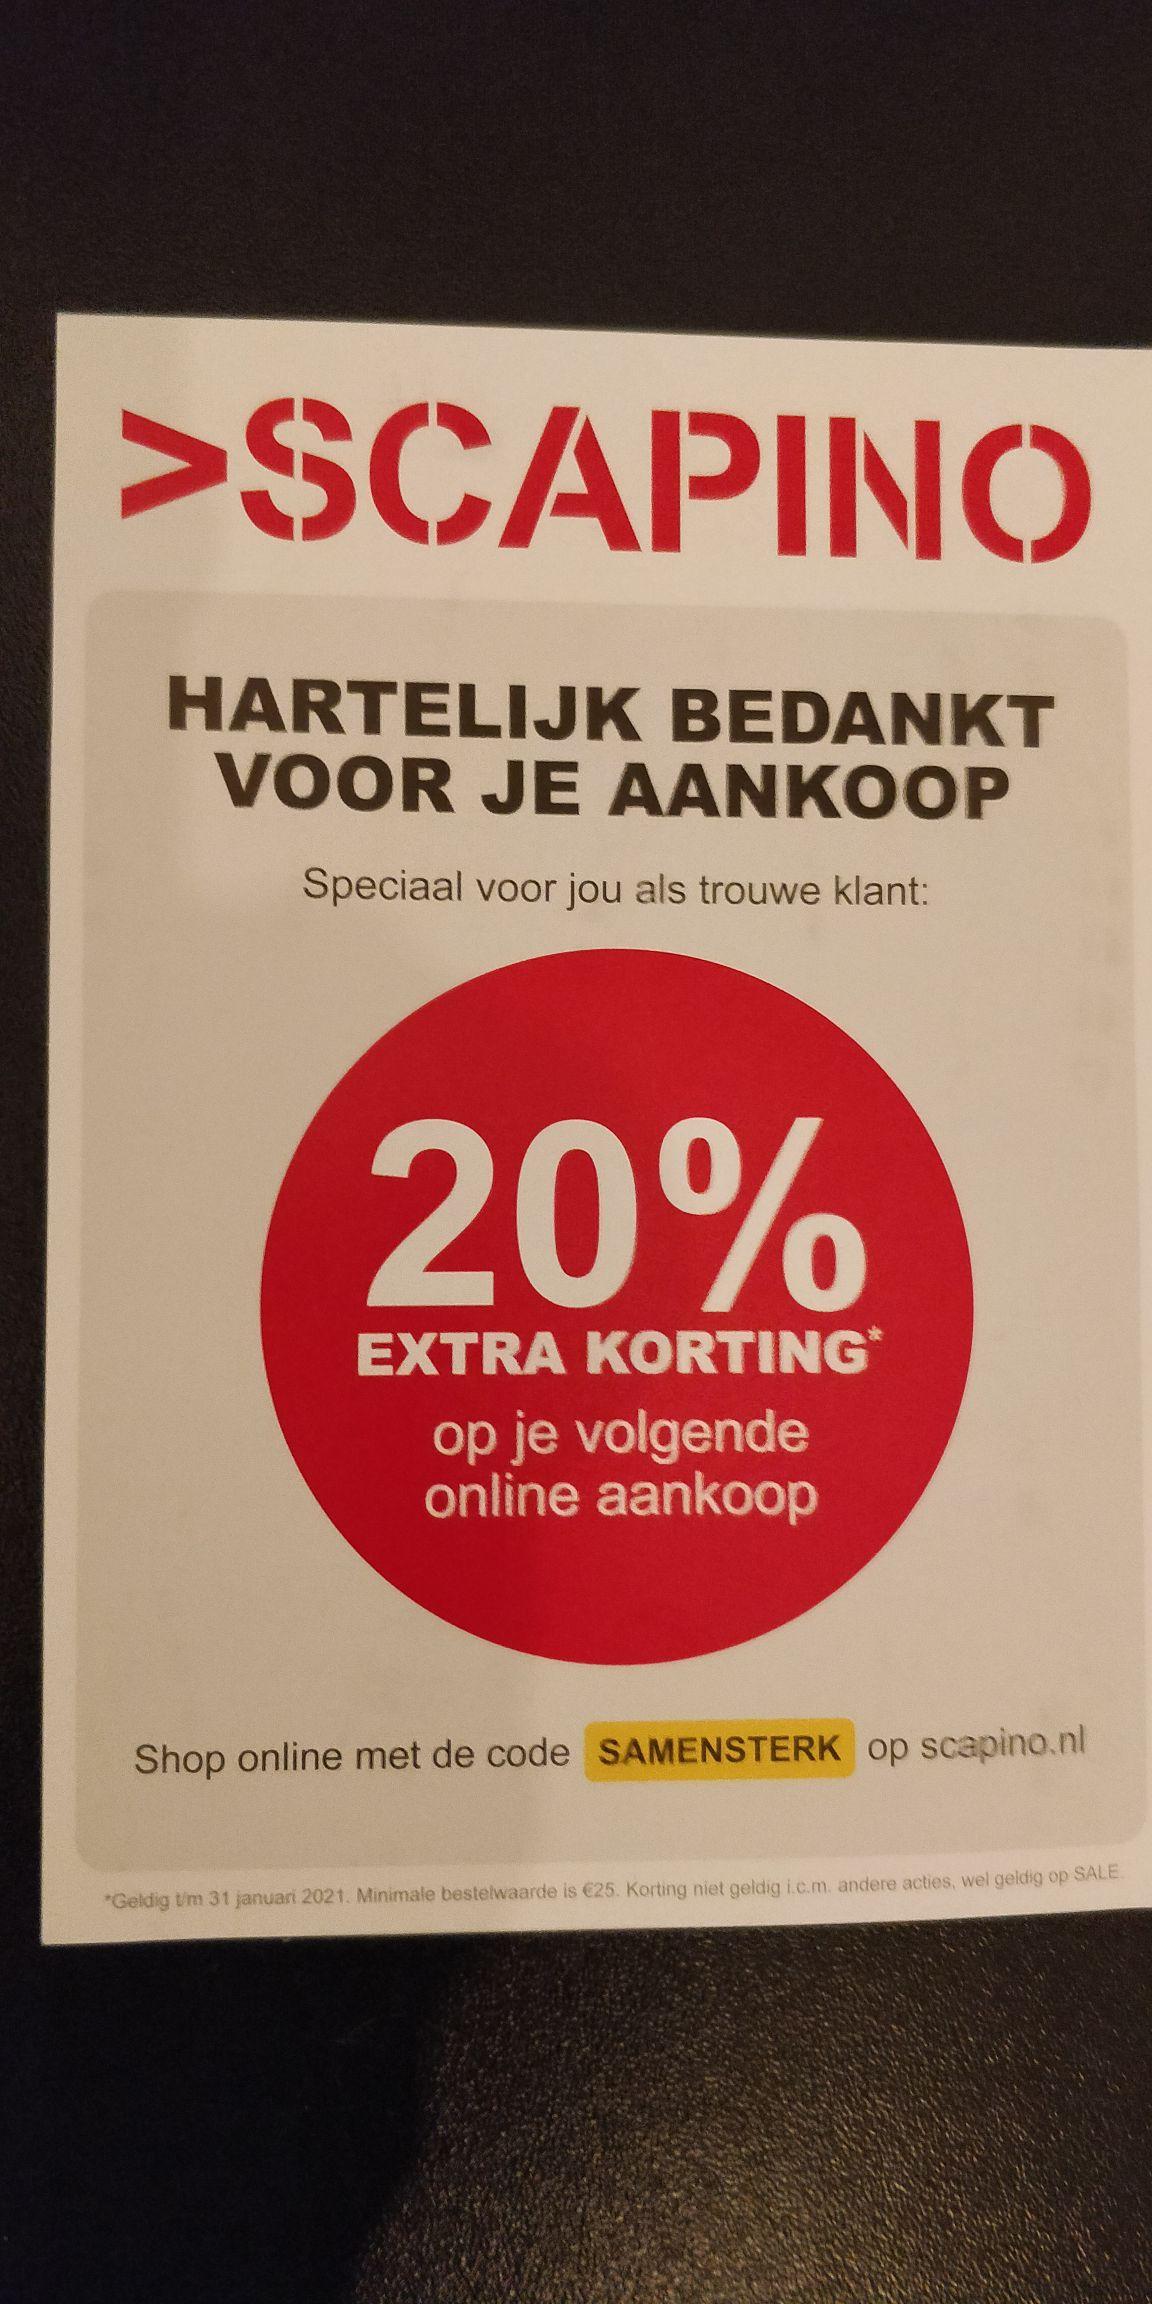 Scapino kortingscode 20% korting (ook op sale)